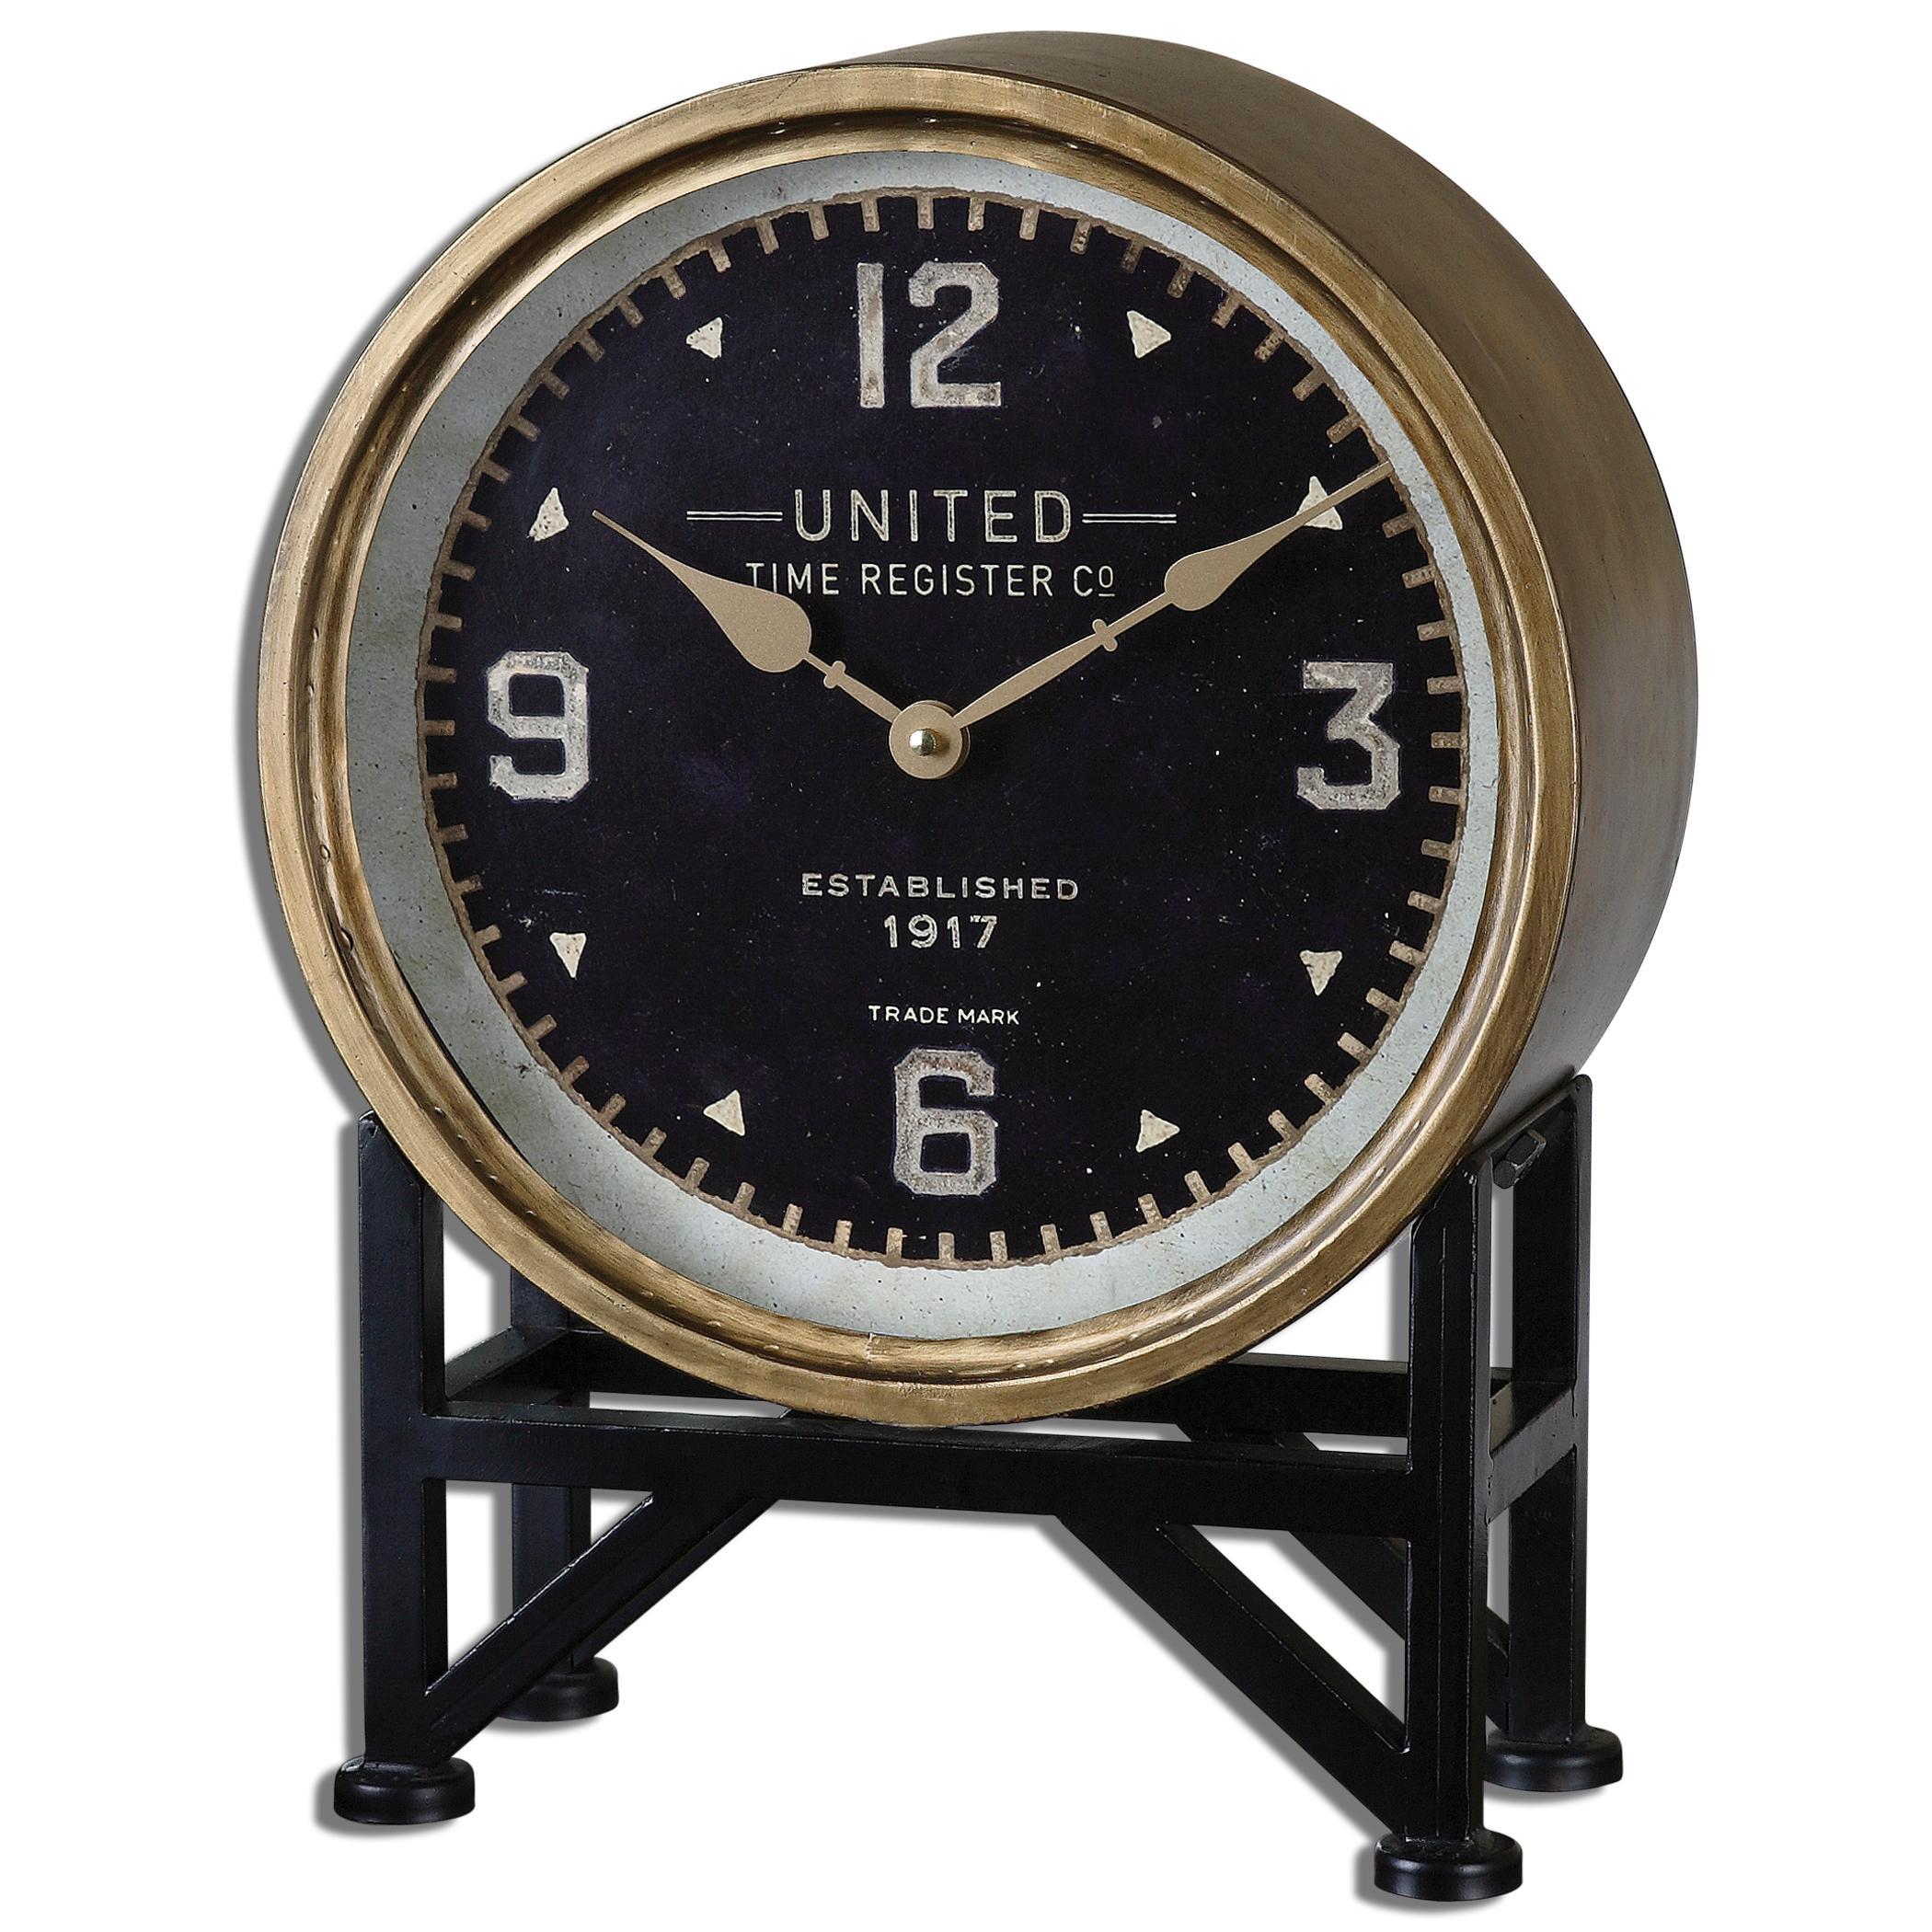 Uttermost Clocks Shyam Table Clocks - Item Number: 06094